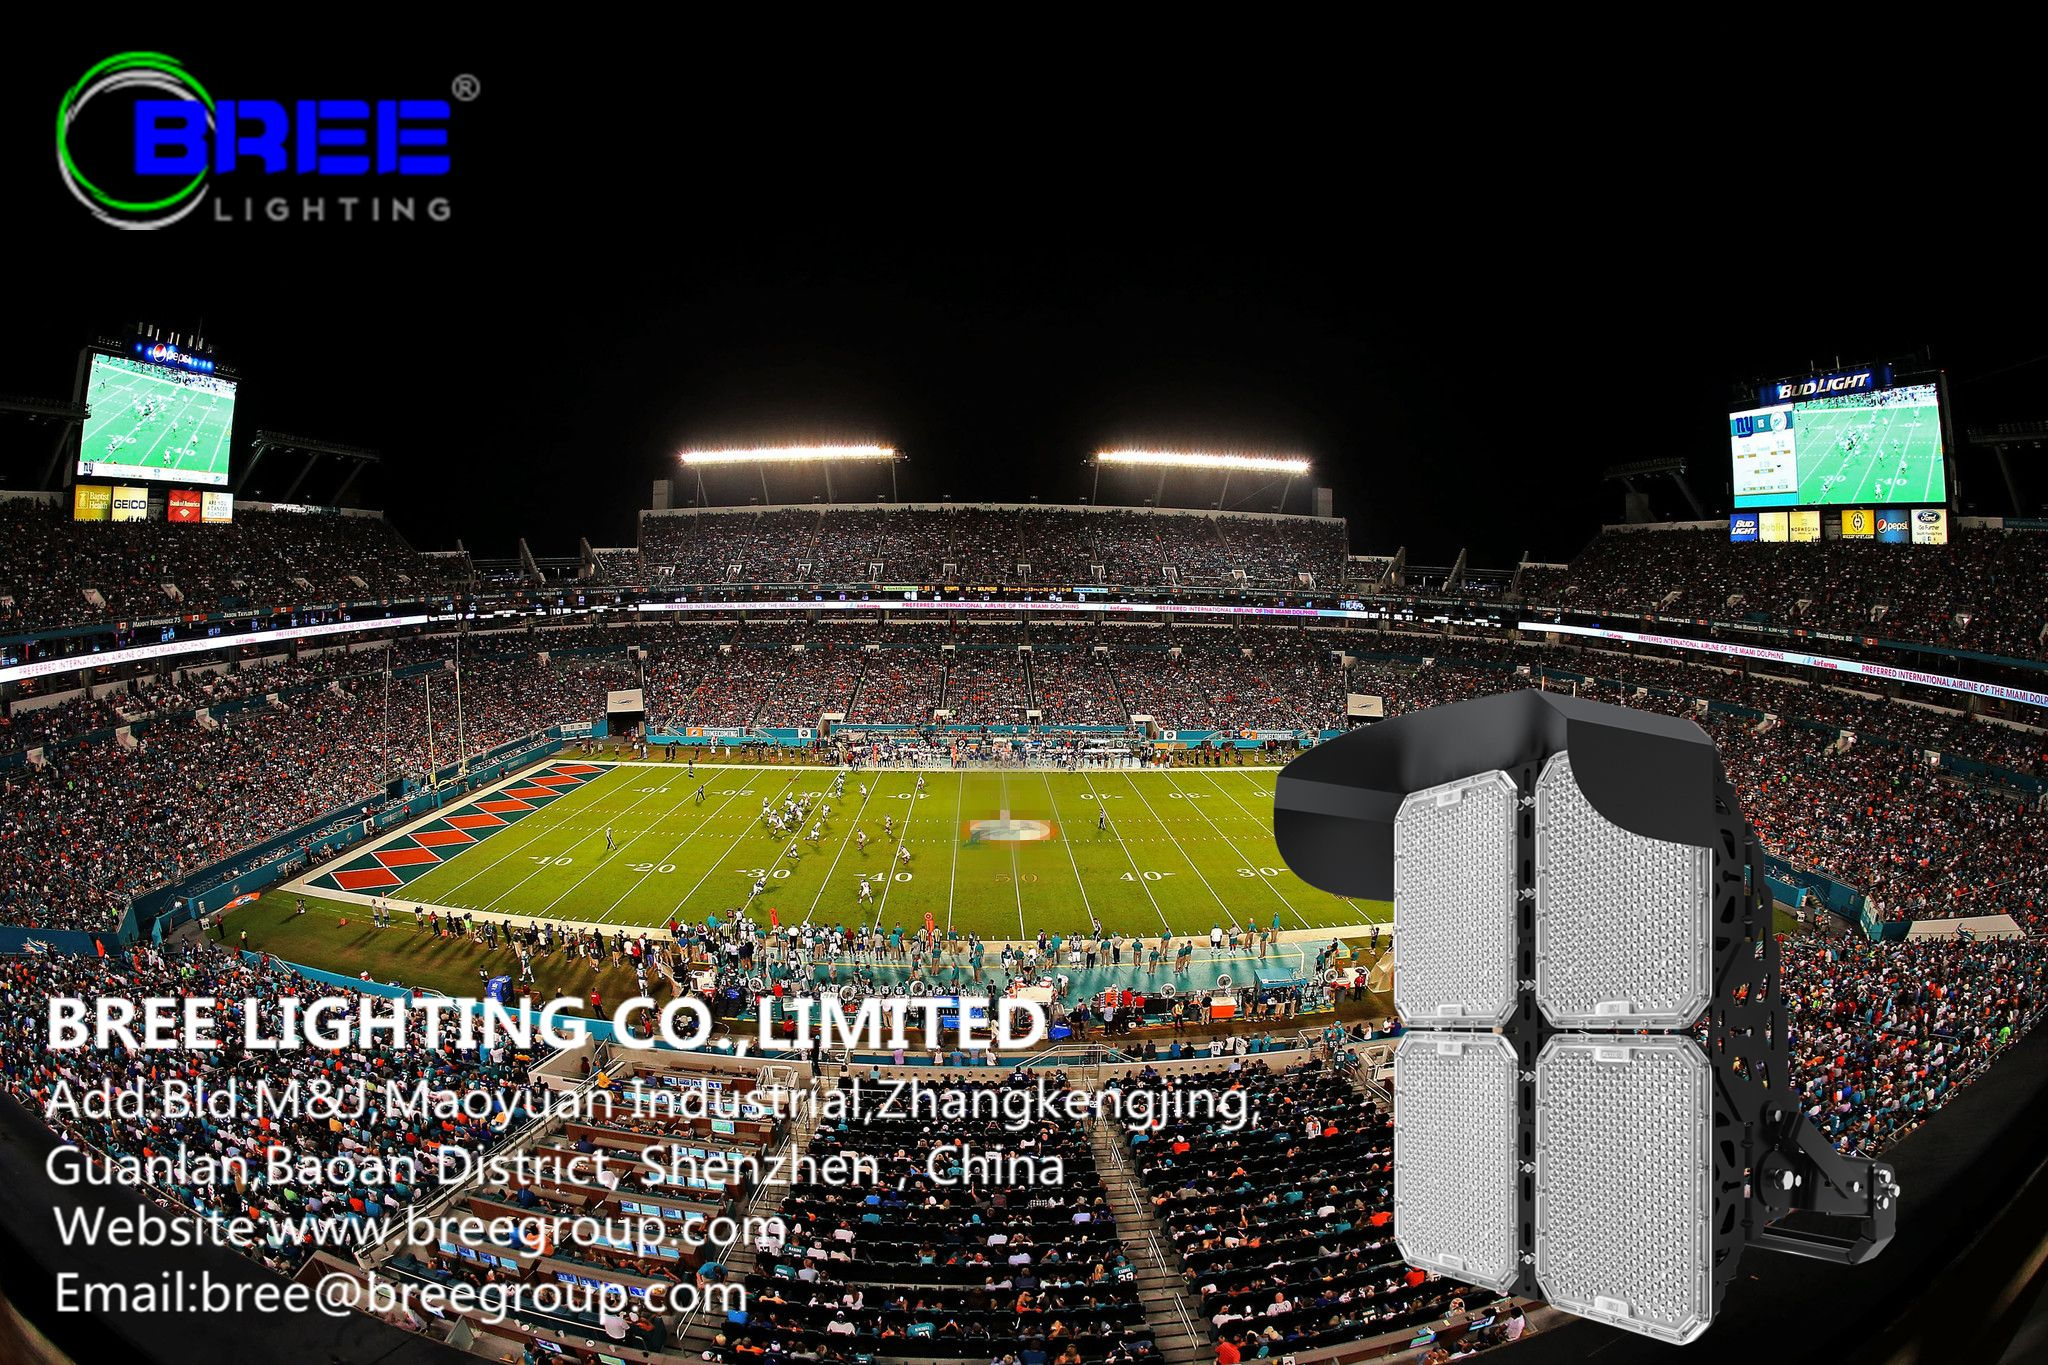 Led Floodlight 1000w Led Sports Light Sports Field Lighting Website Www Breegroup Com Email Bree Breegroup Com